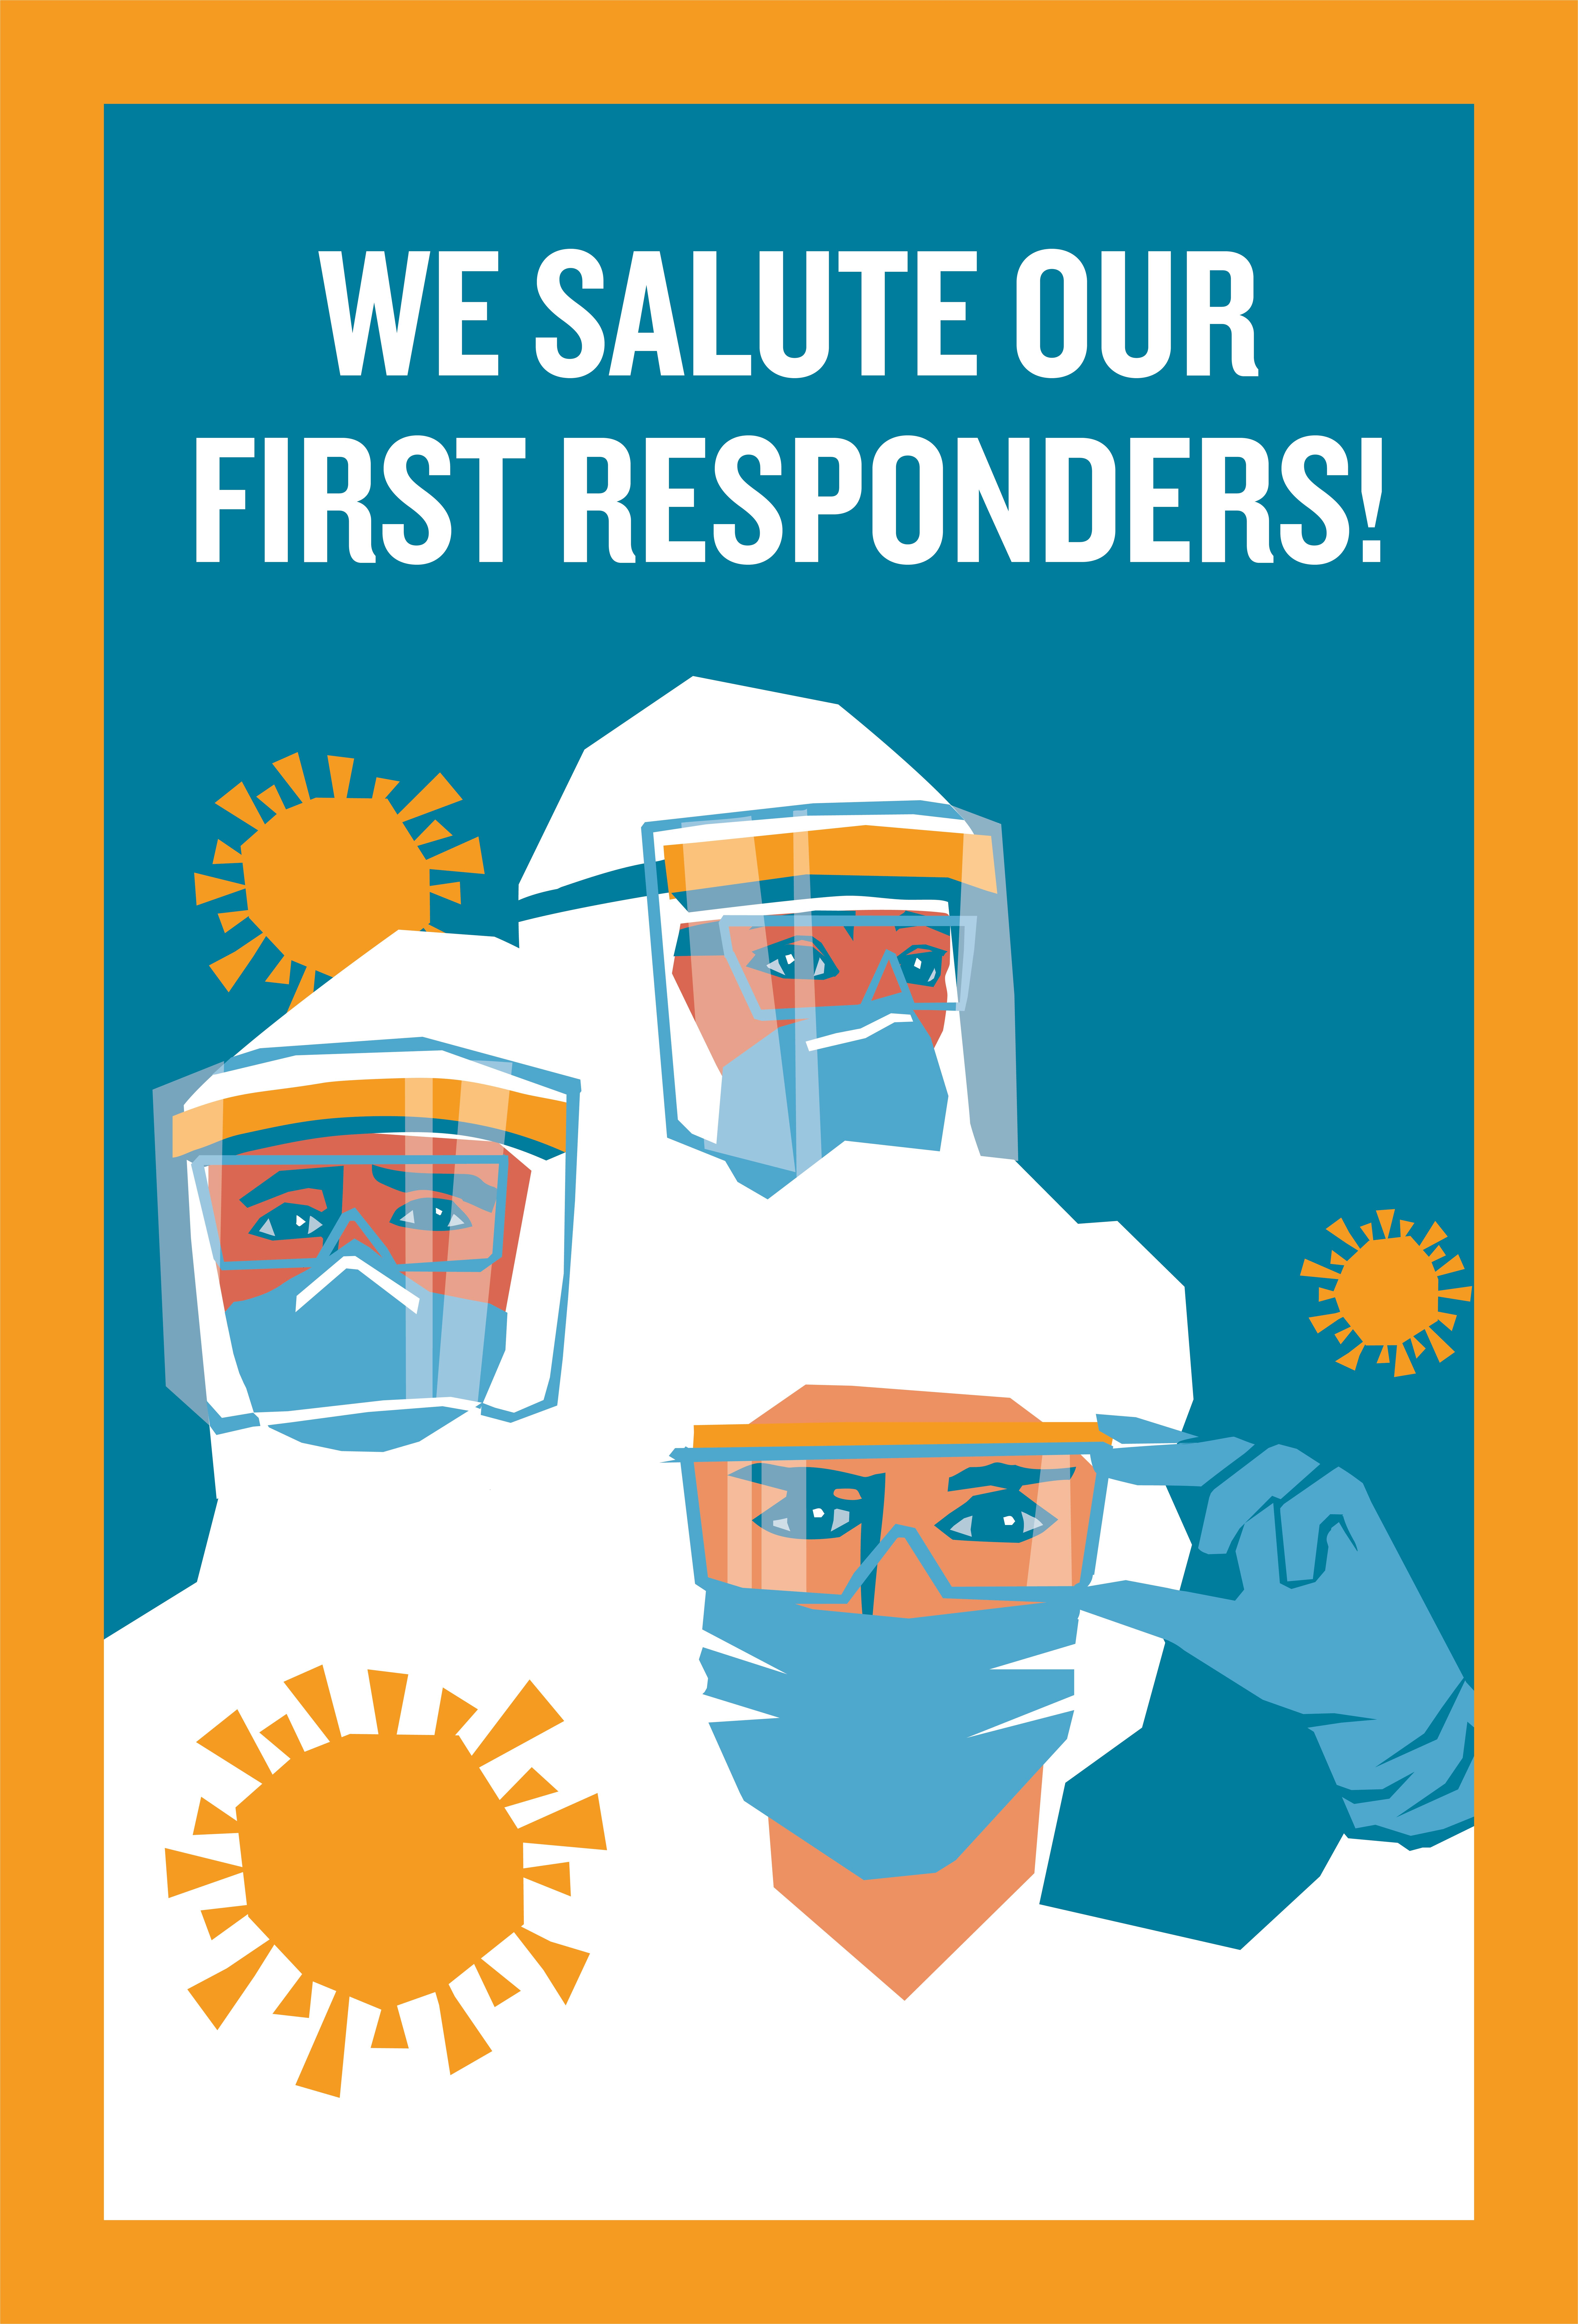 #CV983-salute first responders